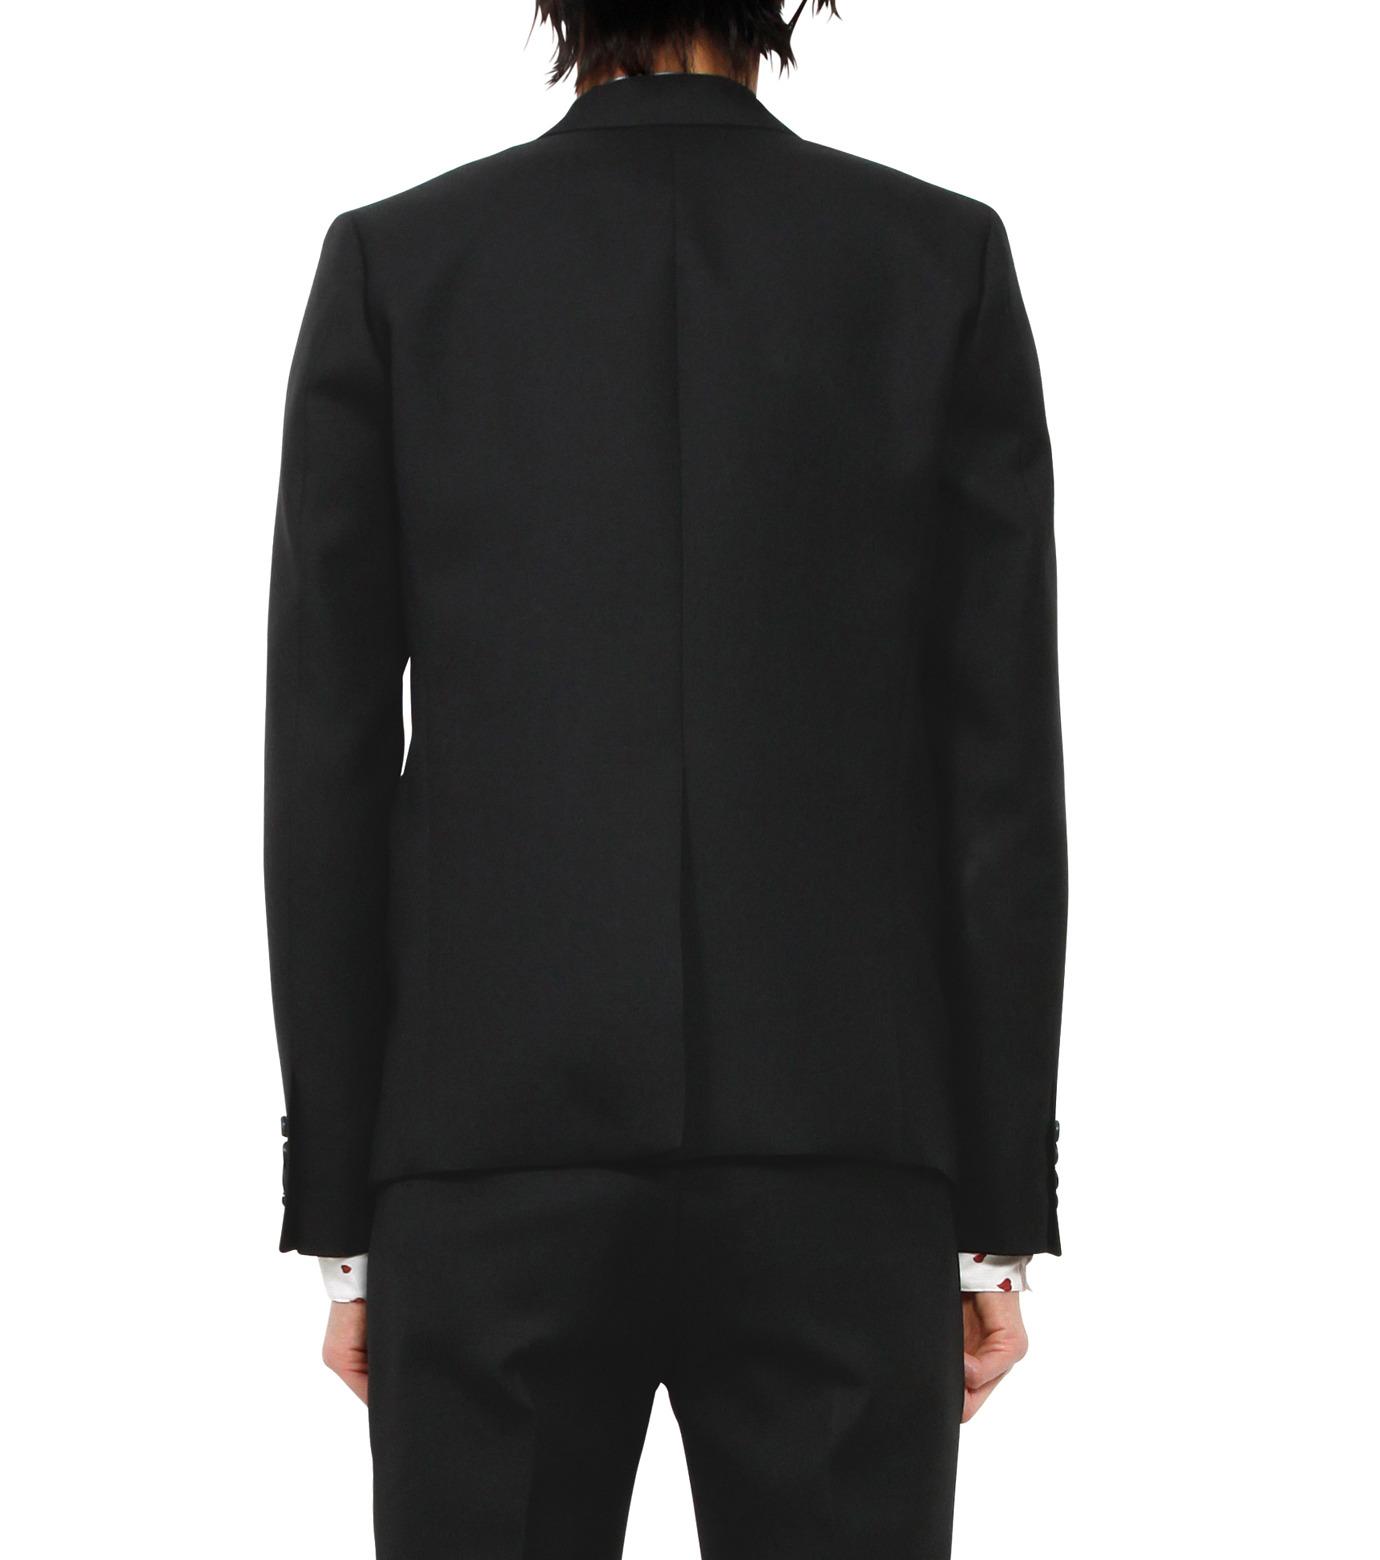 HL HEDDIE LOVU(エイチエル・エディールーヴ)のPEAKED LAPEL 1B JK-BLACK(ジャケット/jacket)-18S94005-13 拡大詳細画像2